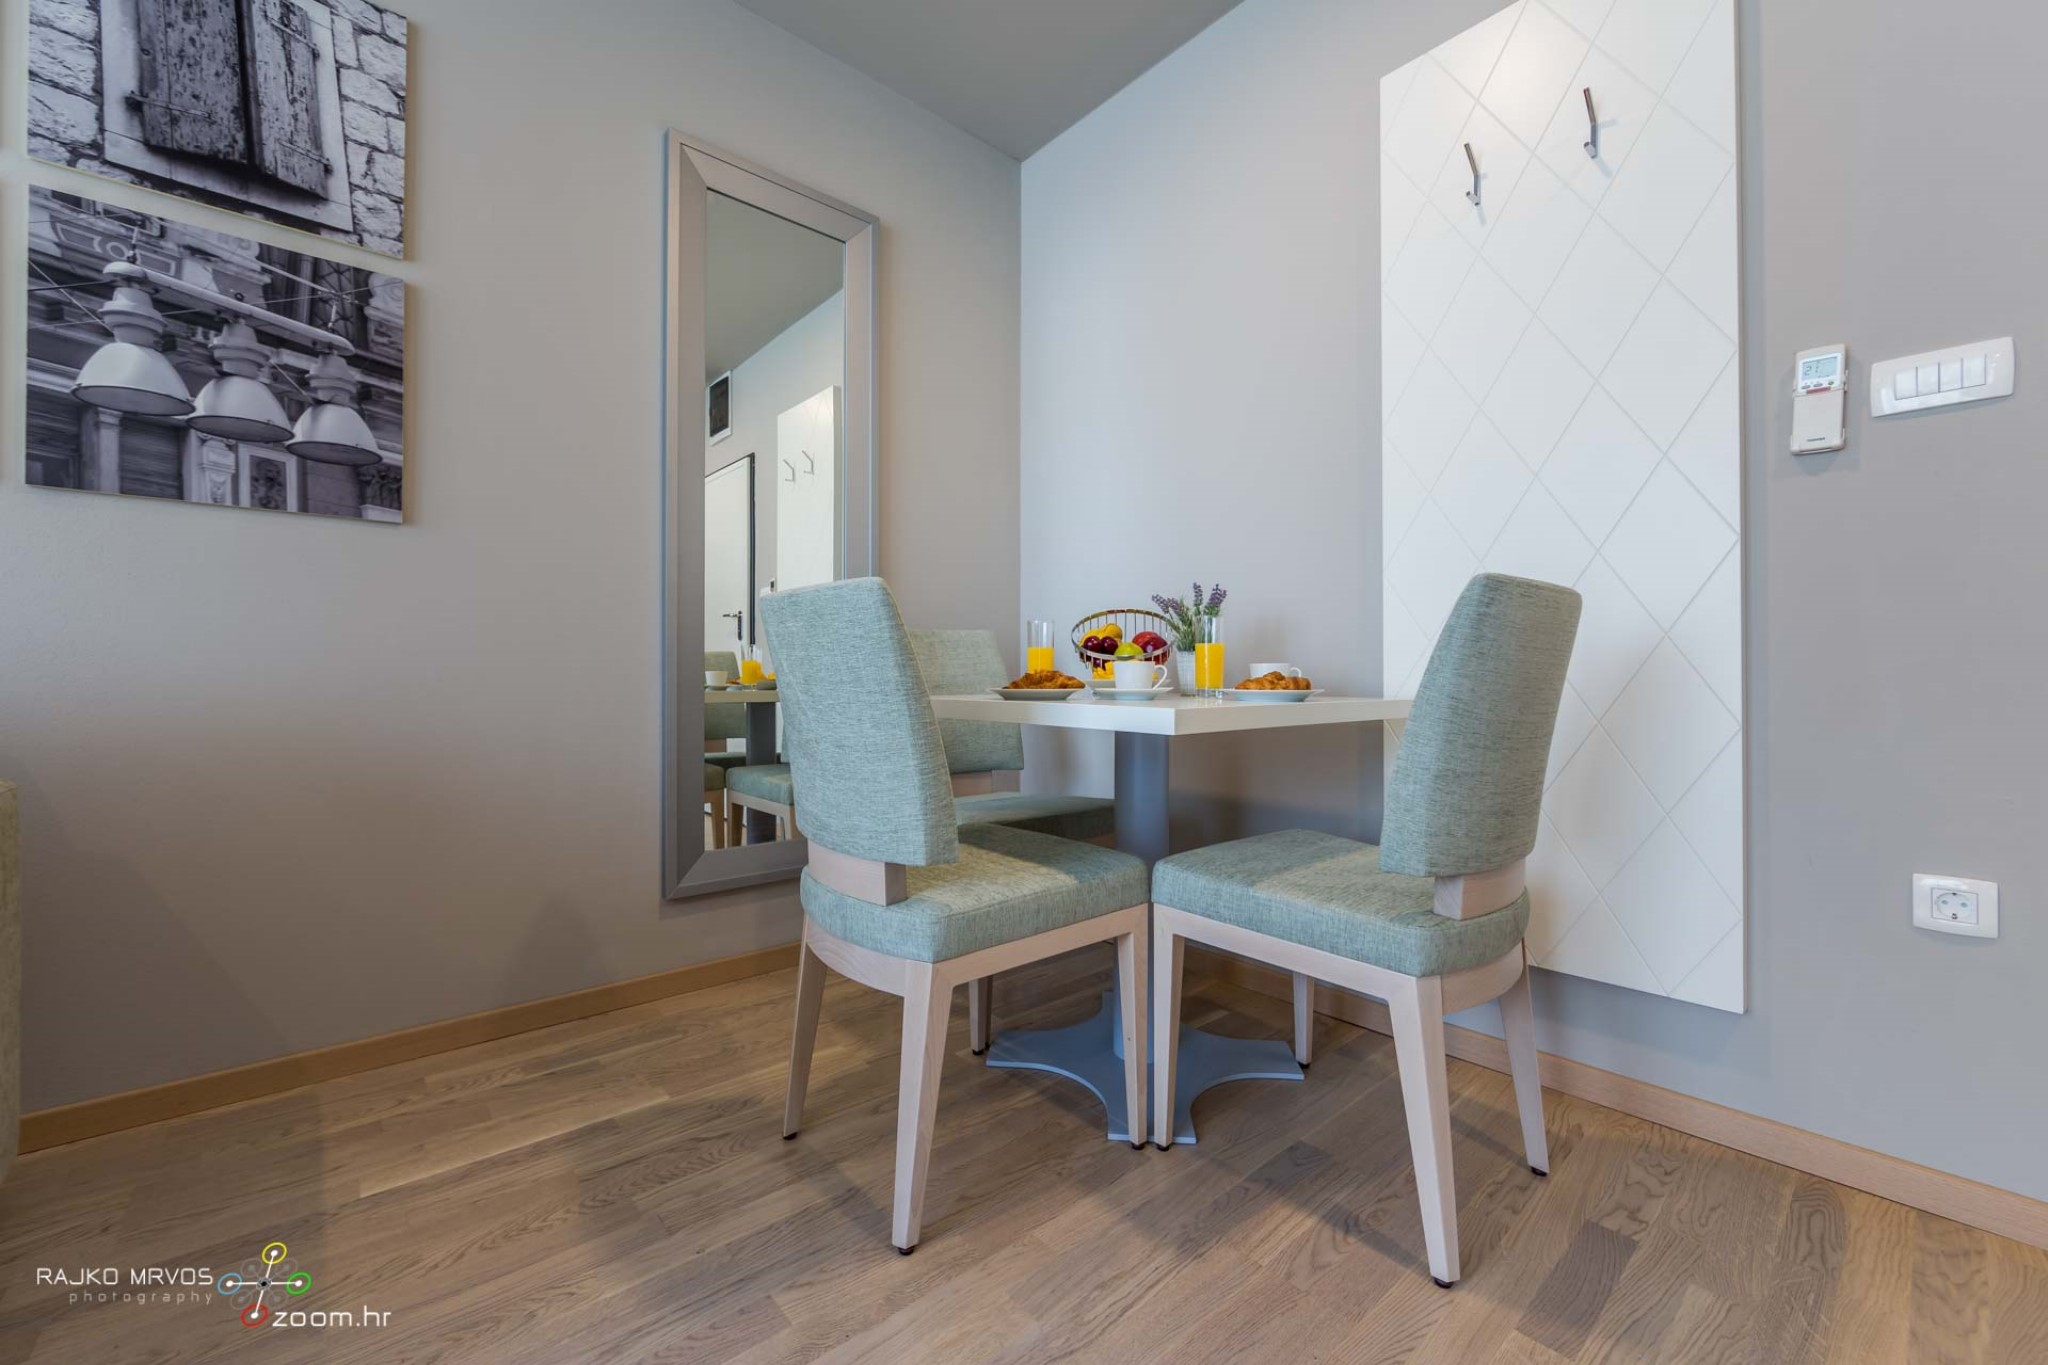 fotografiranje-interijera-fotograf-eksterijera-apartmana-vila-kuca-apartmani-Preelook-69